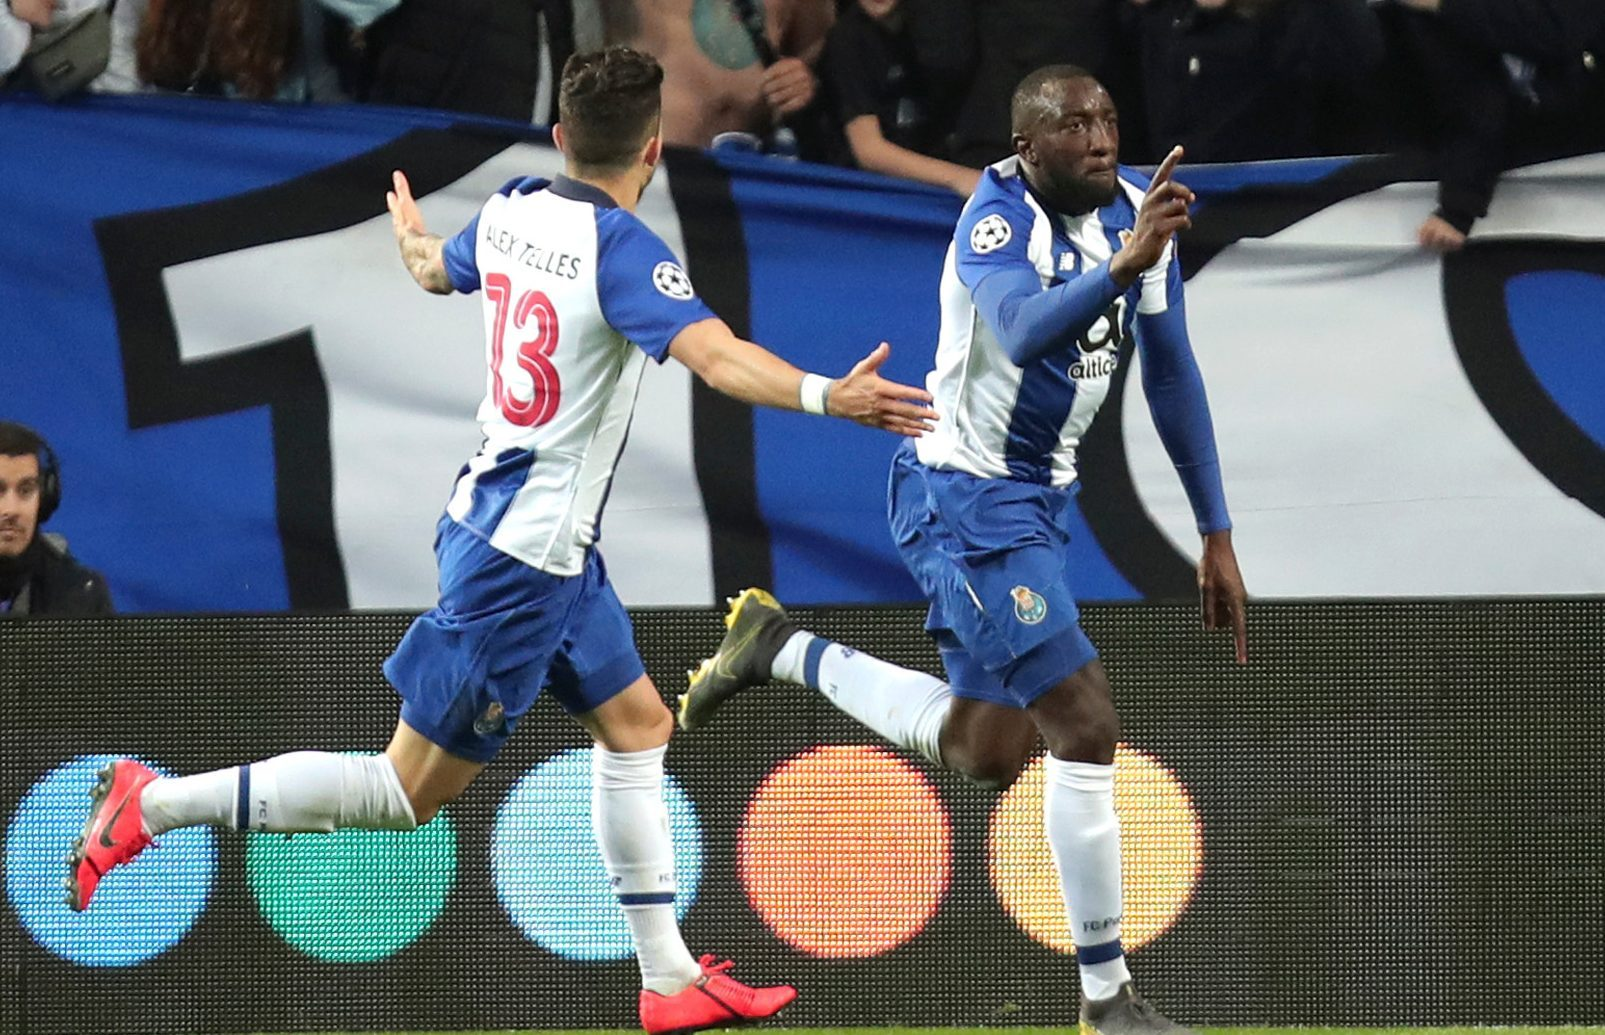 Porto-vs-Rangers-Suc-manh-Hang-rong-23h55-ngay-24-10-Cup-C2-chau-Au-Europa-League-3